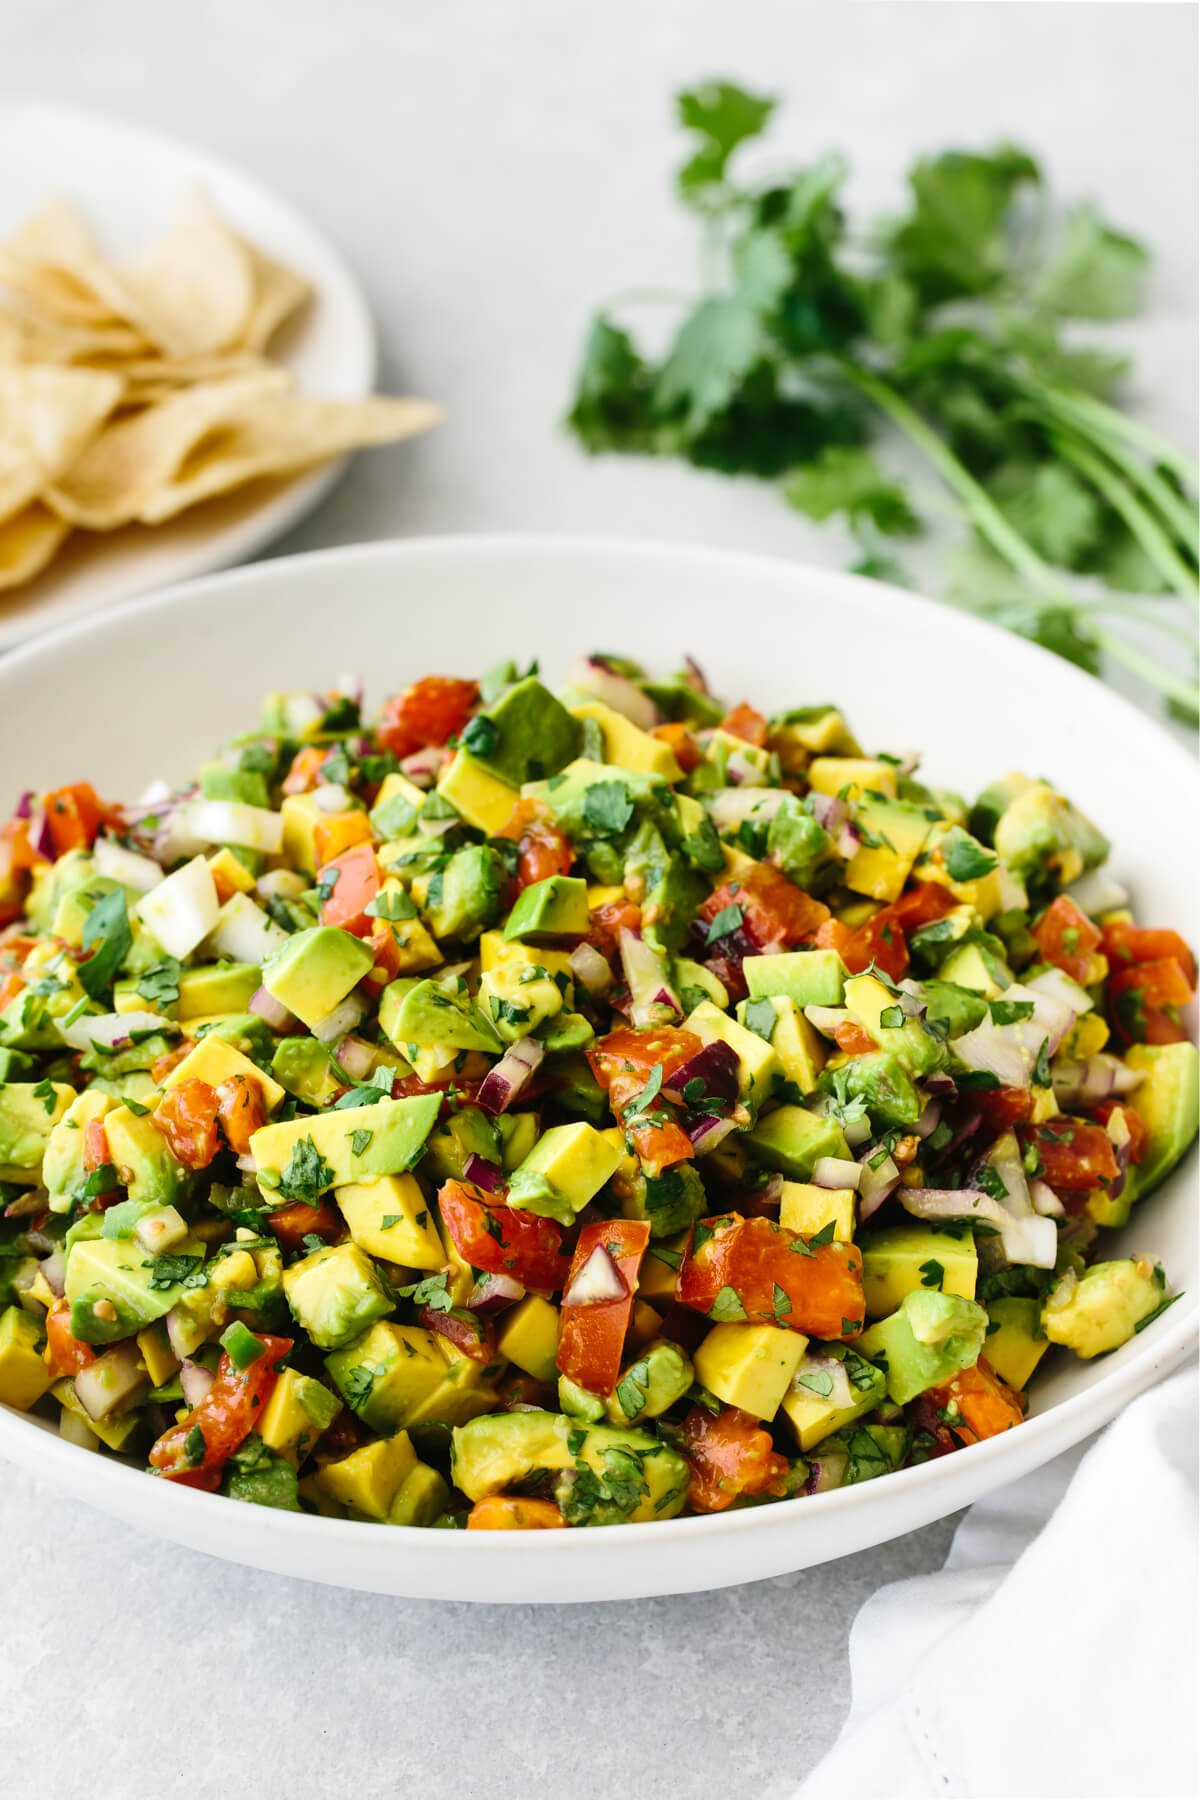 Avocado salsa in a presentation bowl next to tortilla chips and fresh cilantro.